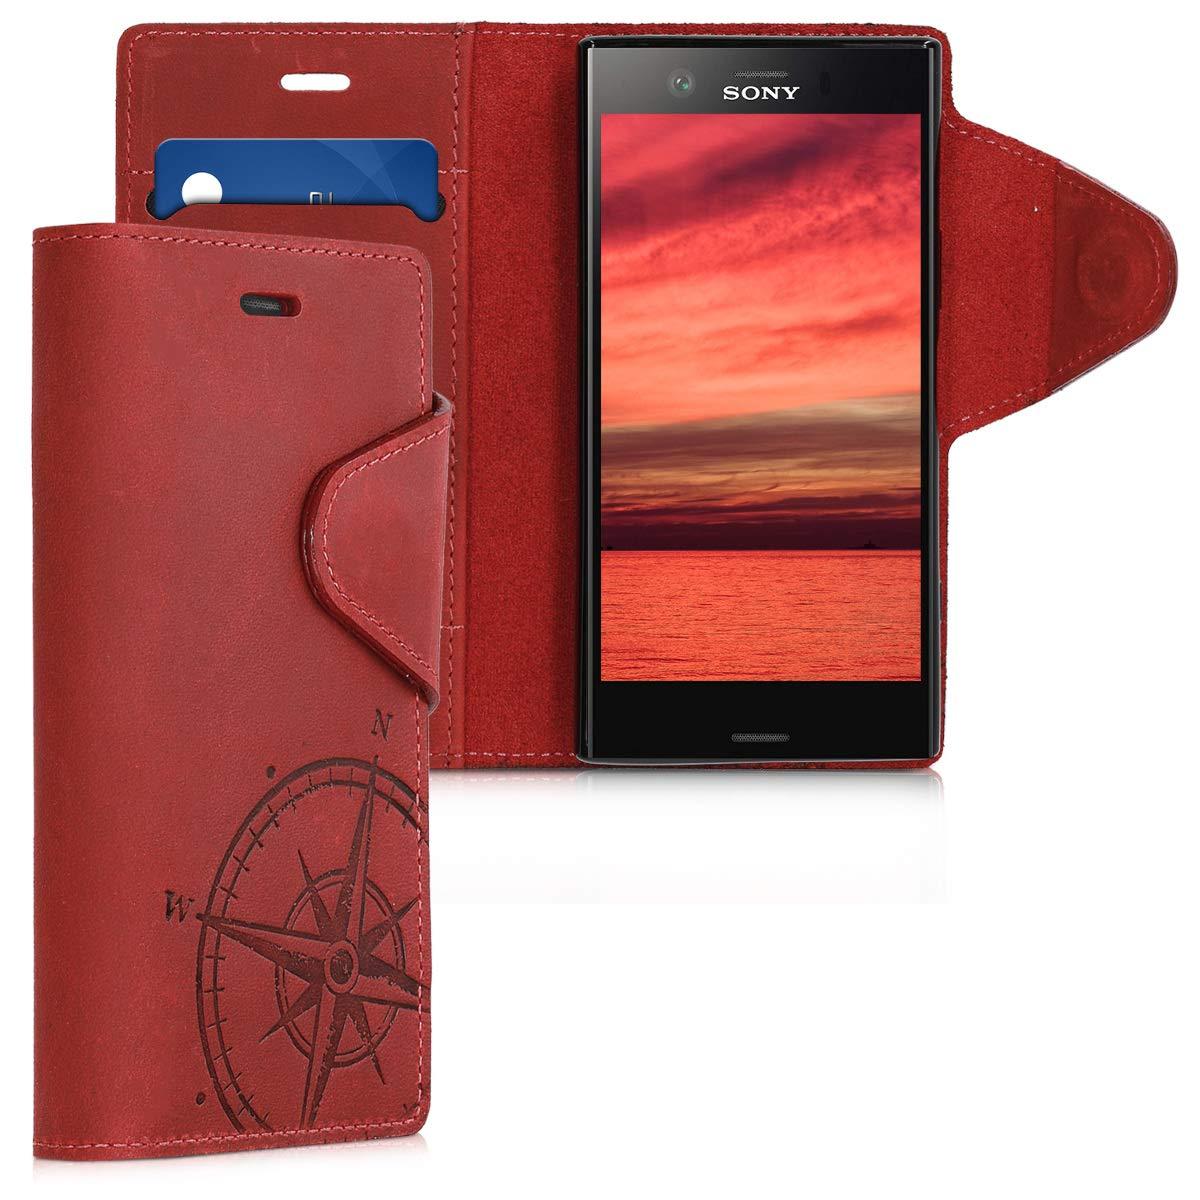 Funda Para Sony Xperia Xz1 Compact Kalibri [7p6rms2f]